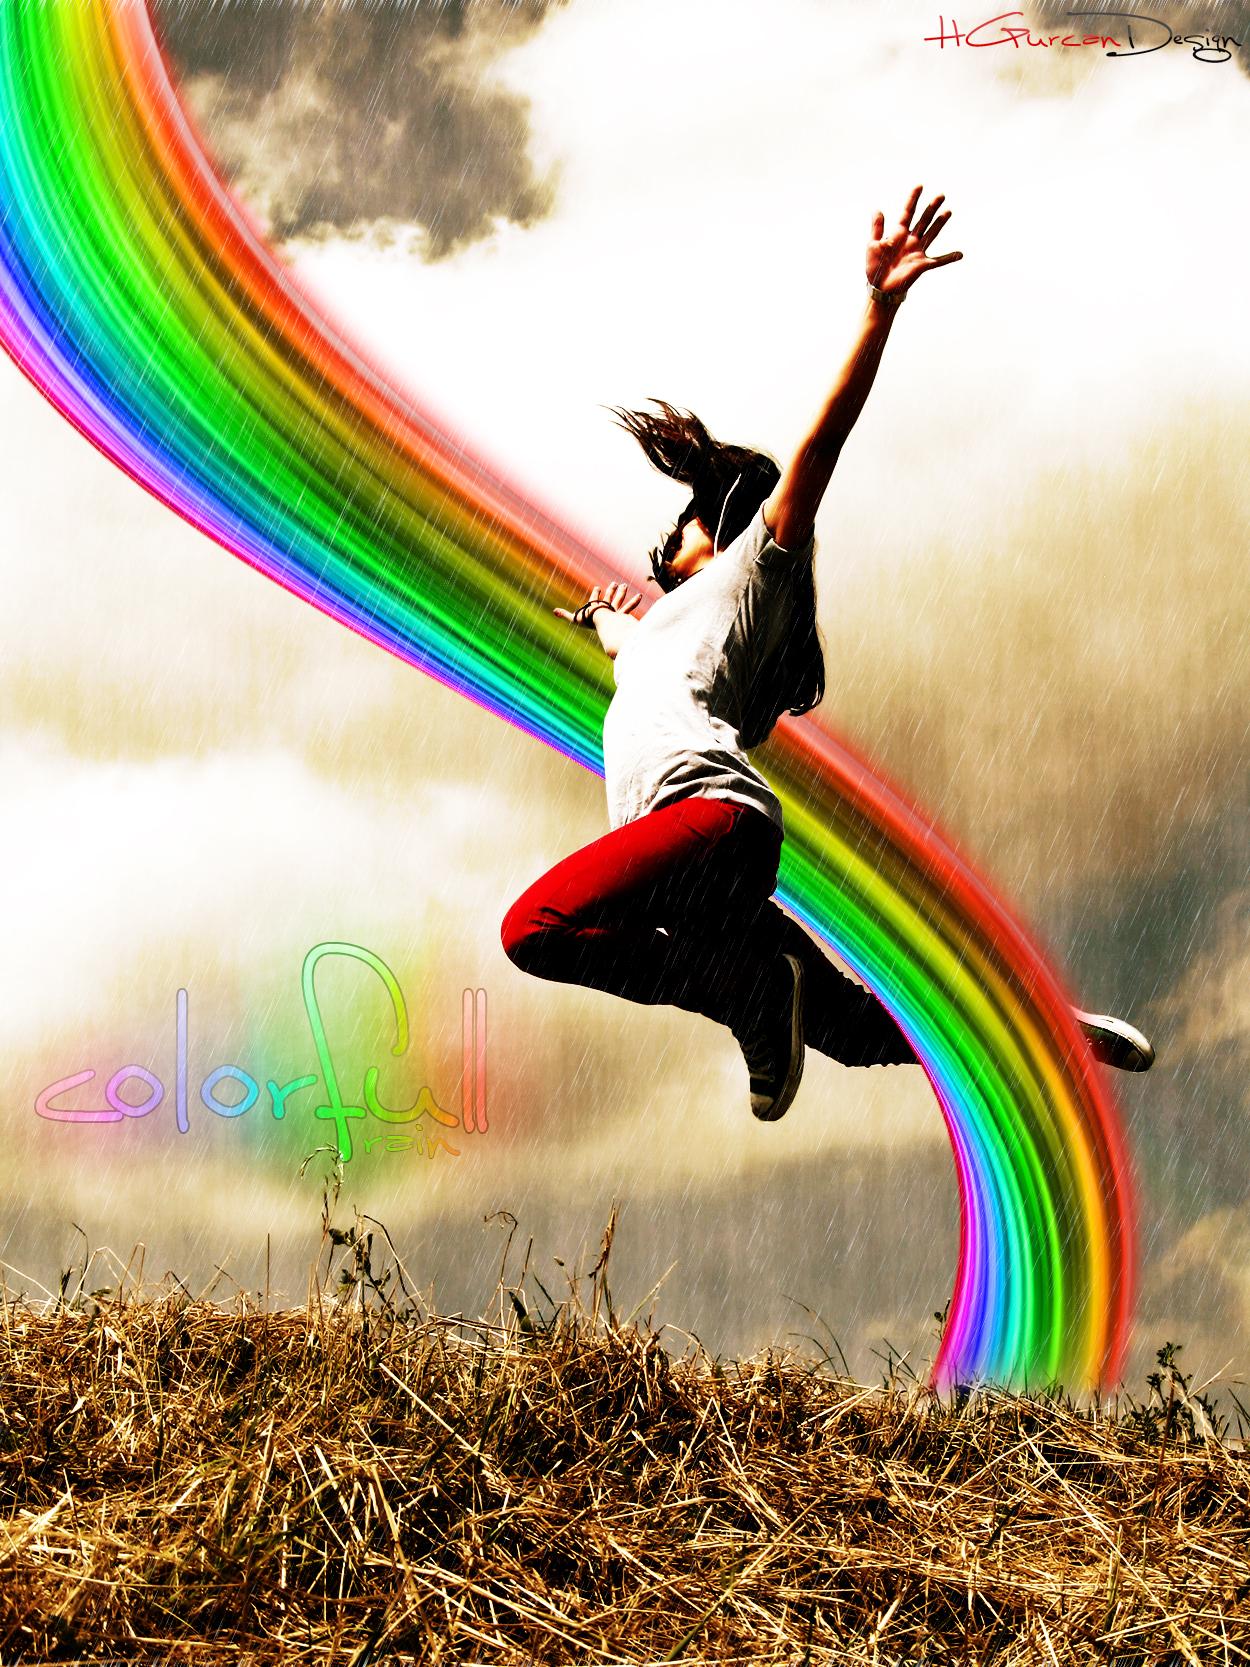 http://fc05.deviantart.net/fs32/f/2008/228/6/6/Colorfull_Rain_Work_by_HGurcan.jpg